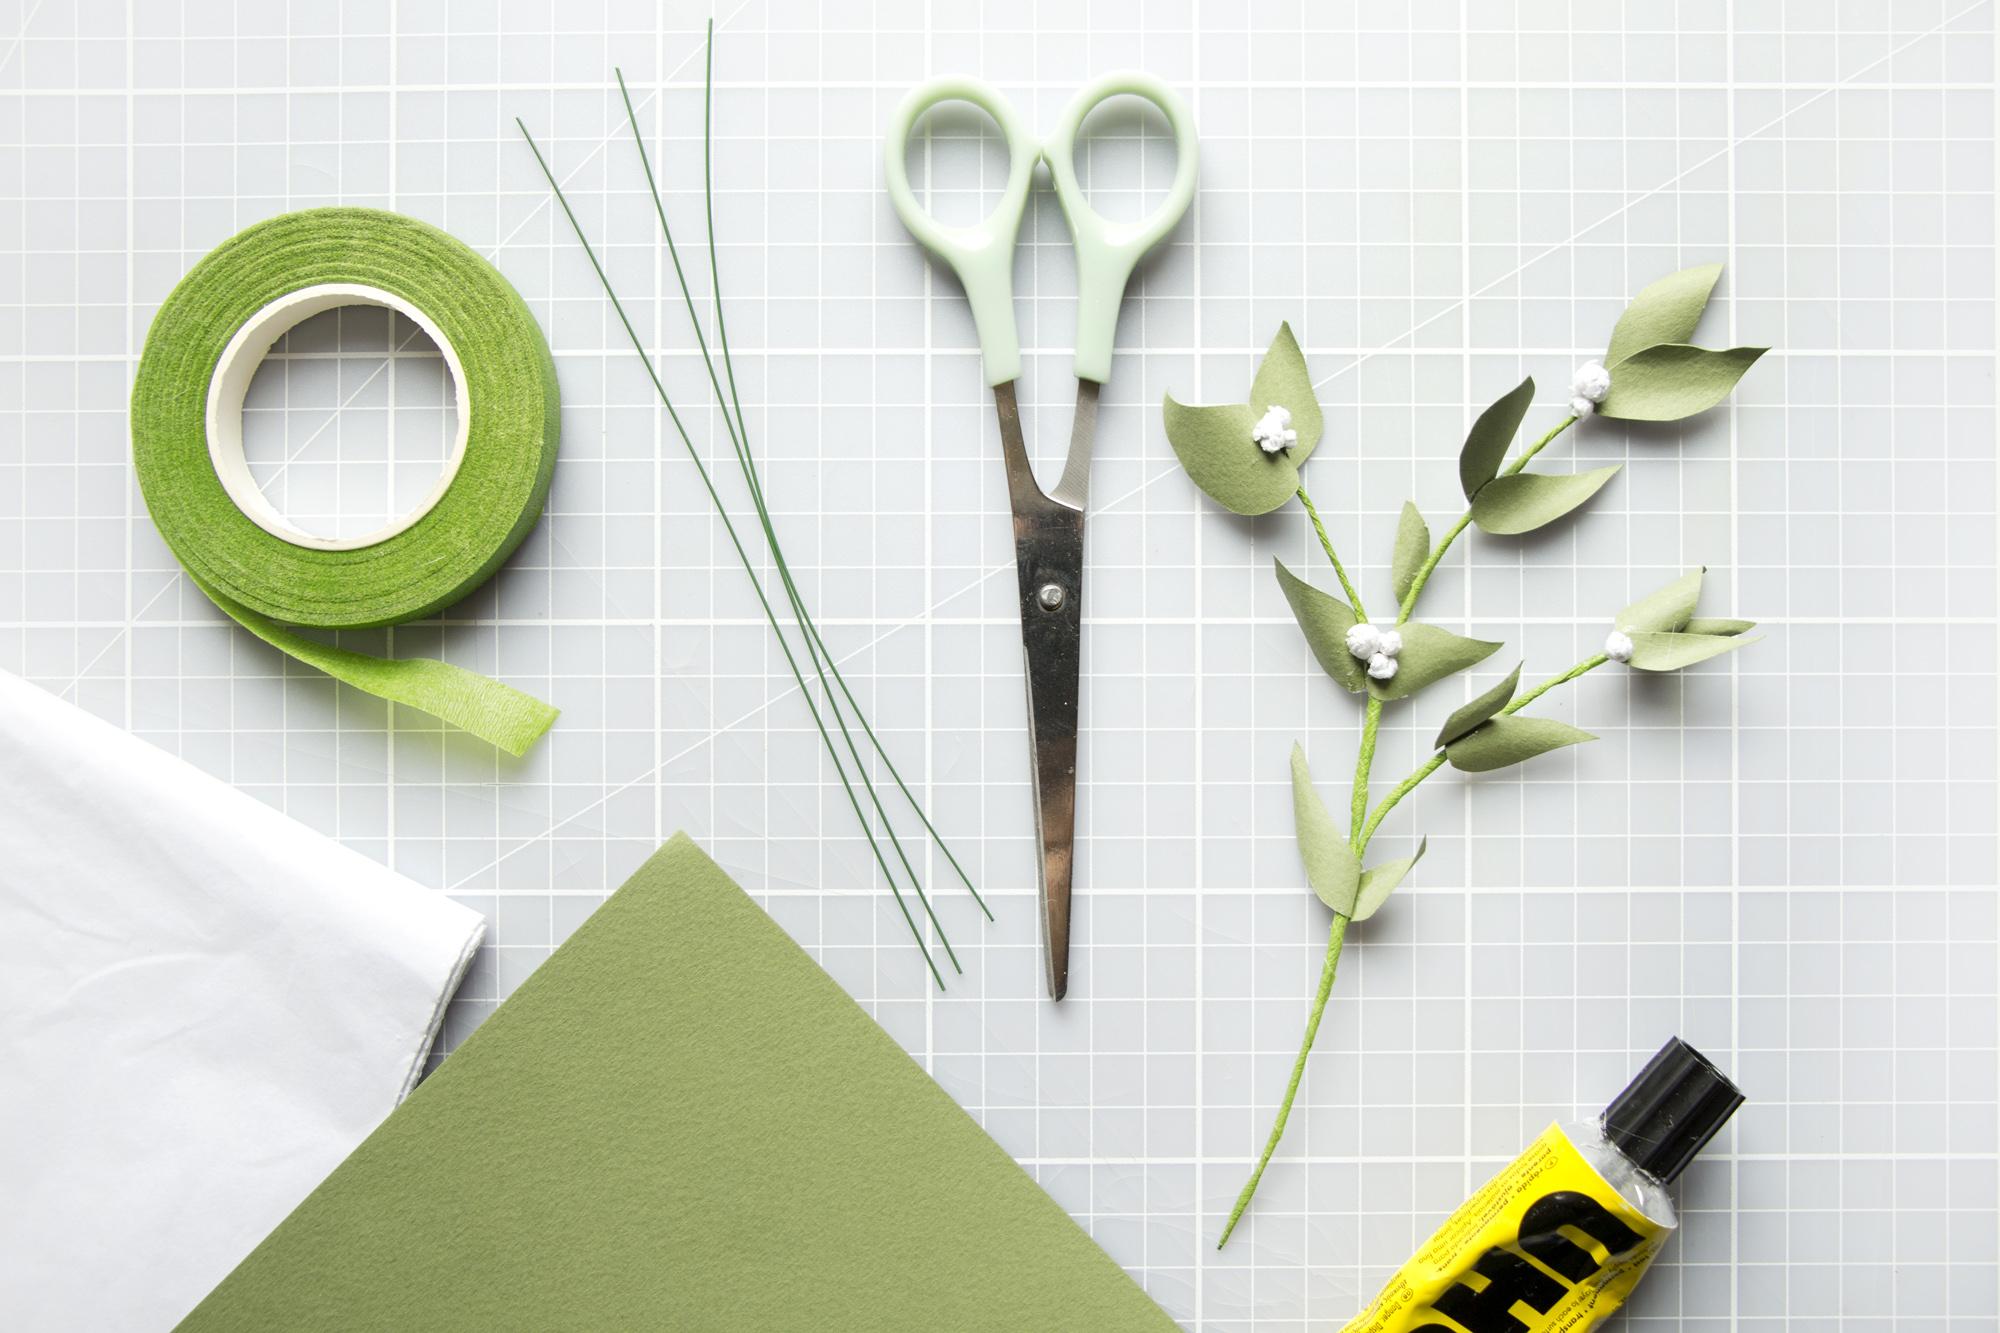 utensils0 - christmas mistletoe workshop - materials